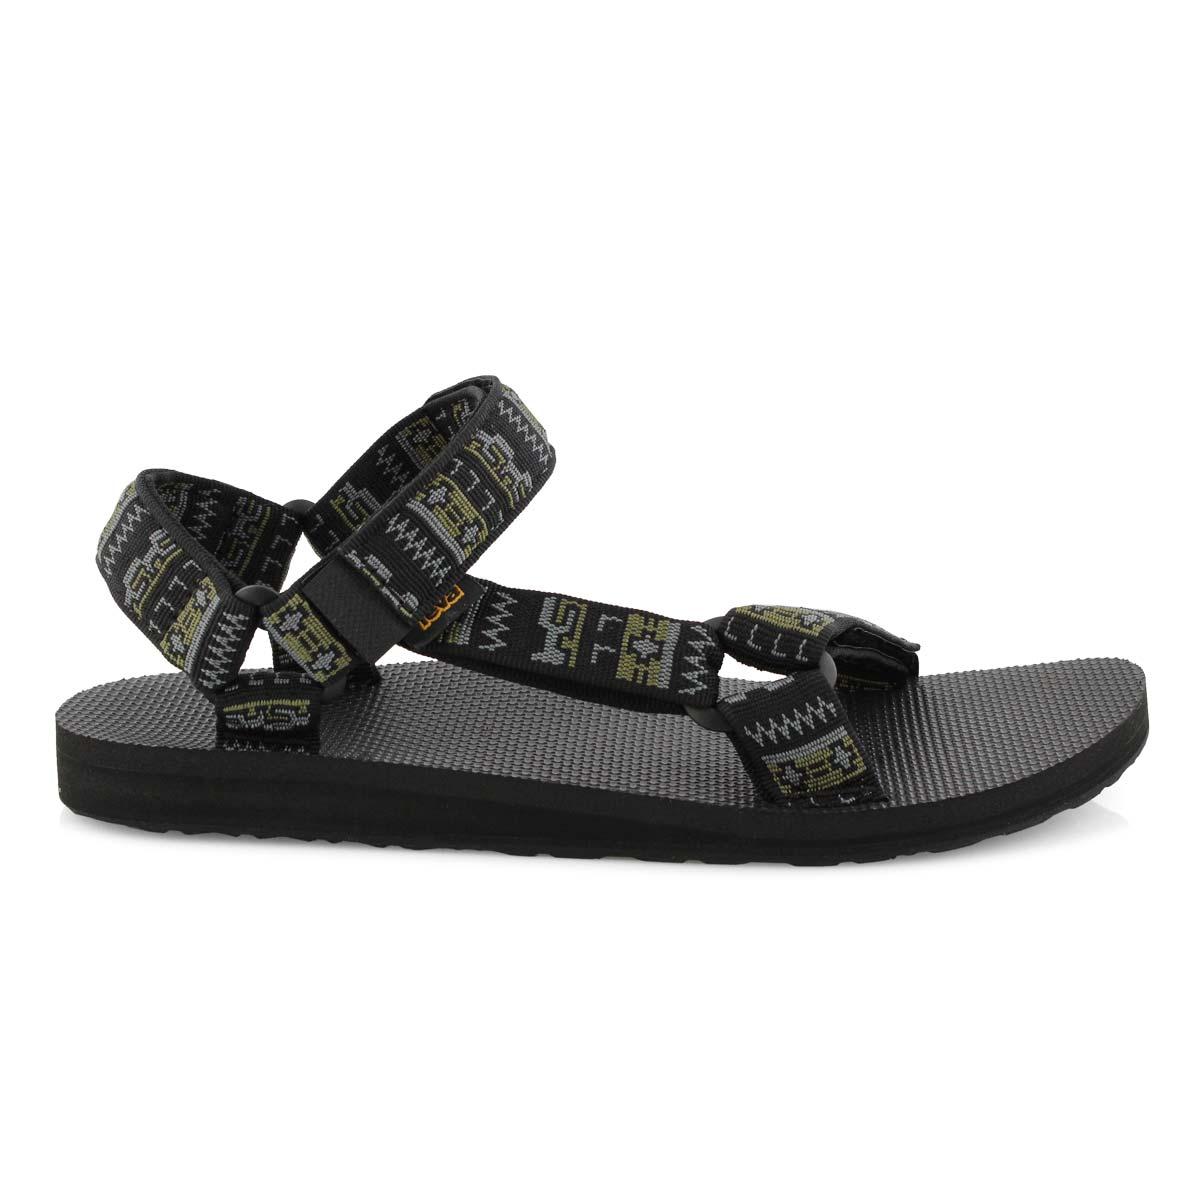 Sandales sport ORIGINAL UNIVERSAL, noires, hommes